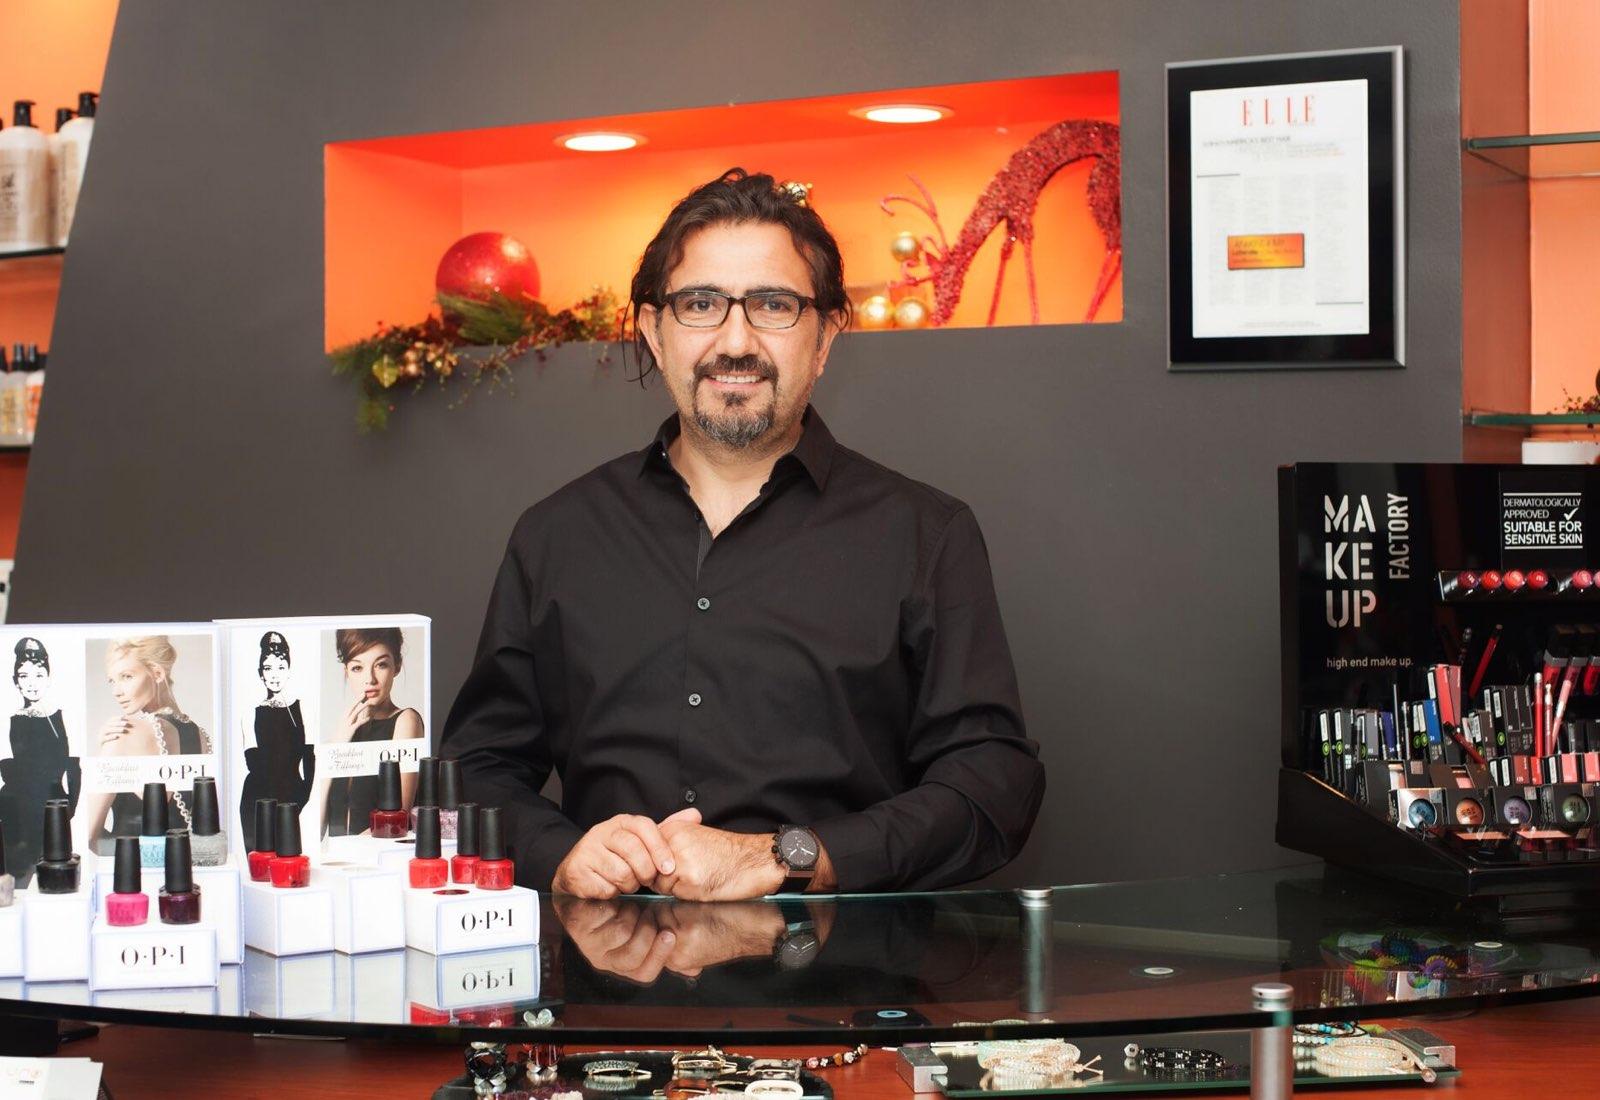 Salon Happy Hours at Uno the Salon - (cool) progeny